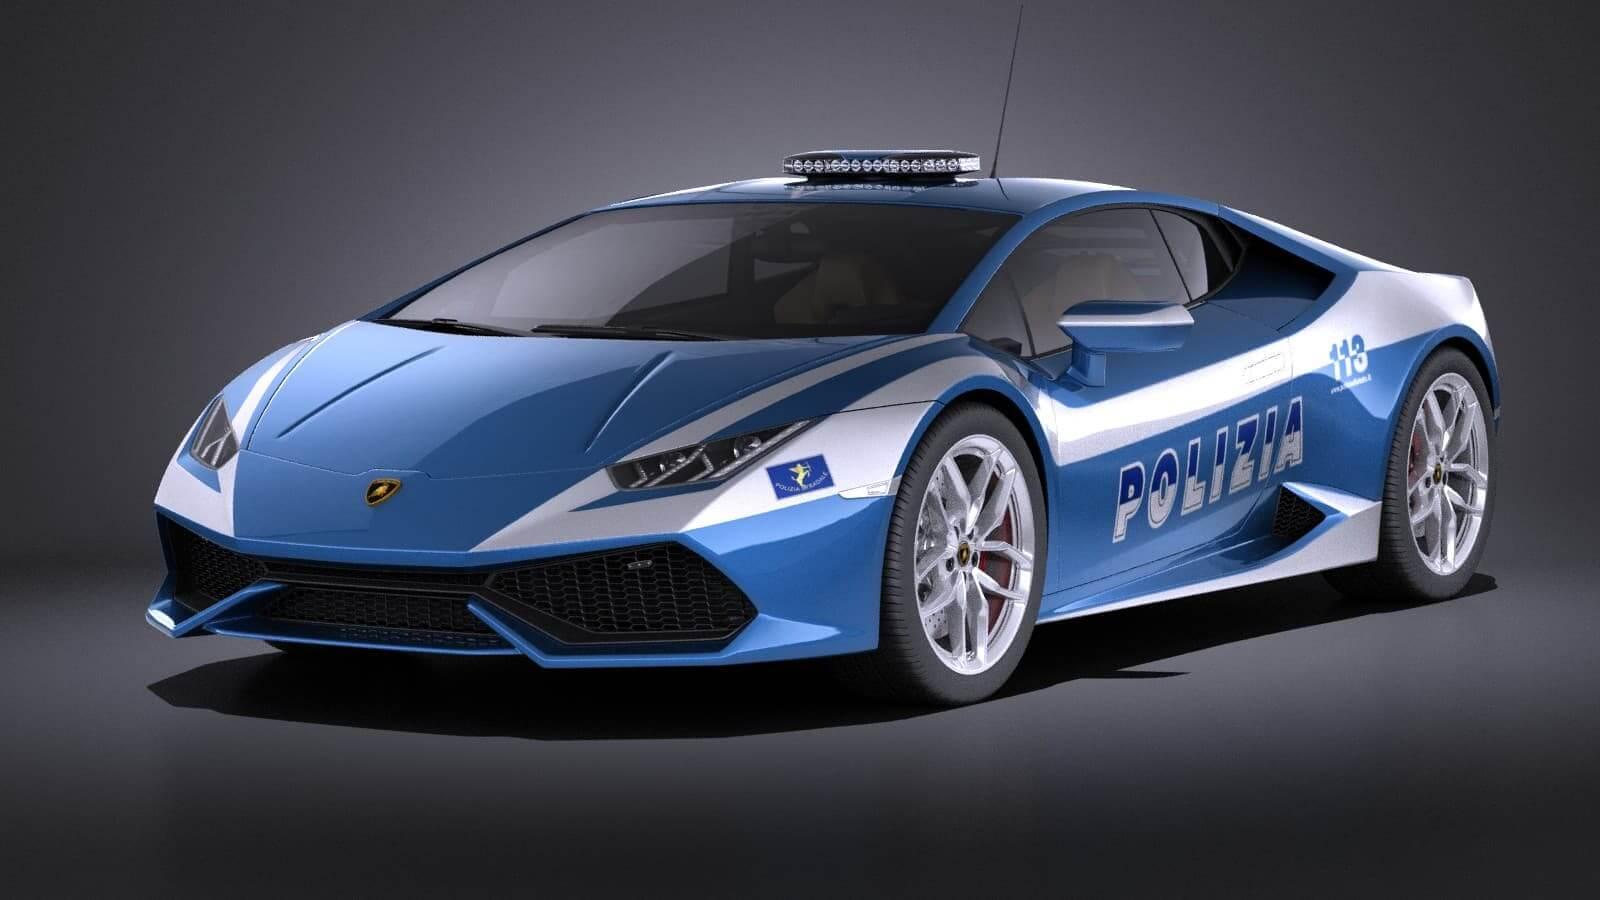 Lamborghini Huracan 2016 Italian Polizia Vray 3d Model